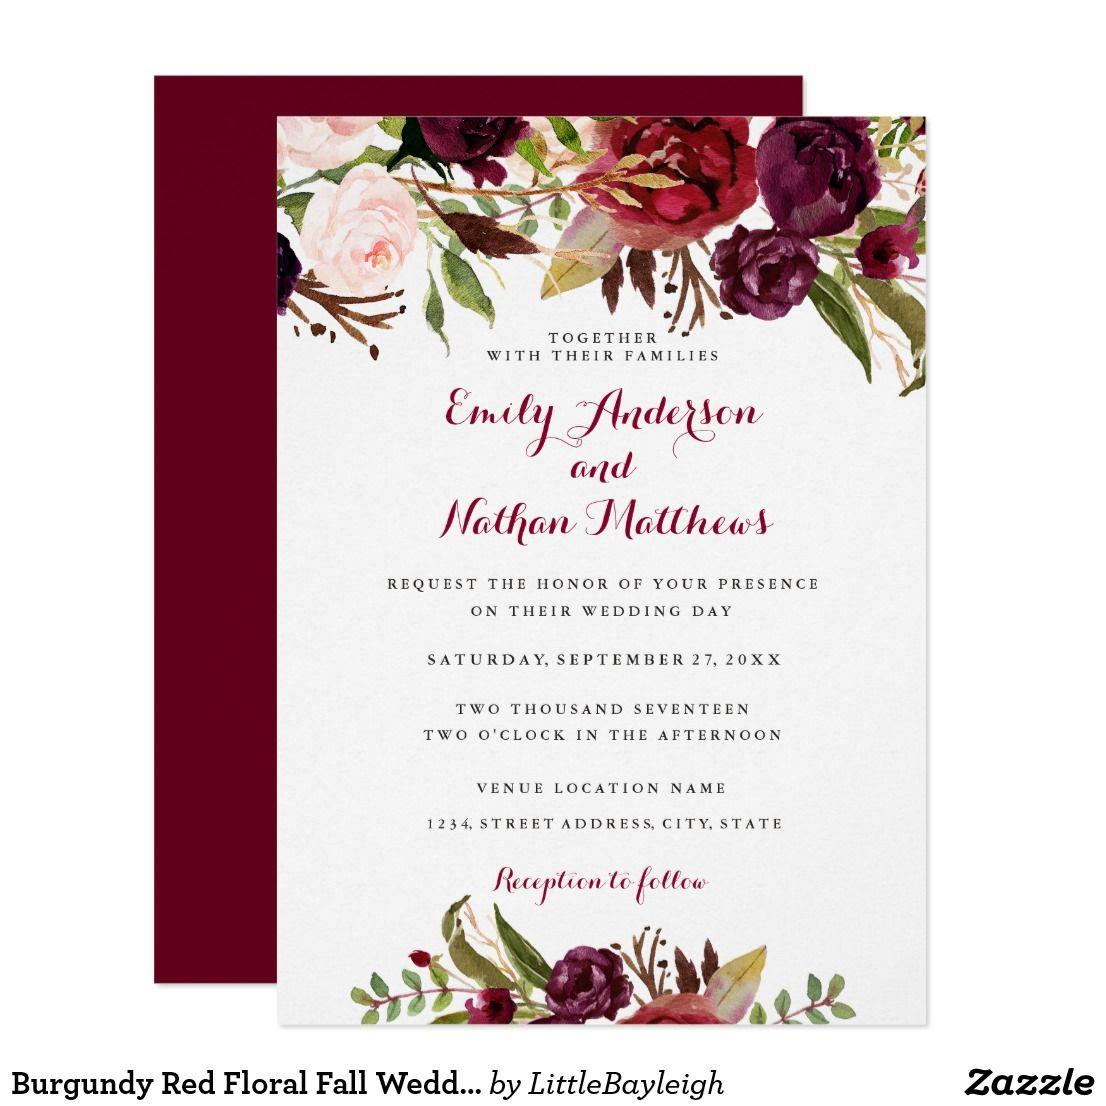 Winter Wedding Invitations Cheap: Burgundy Red Floral Fall Wedding Invitation